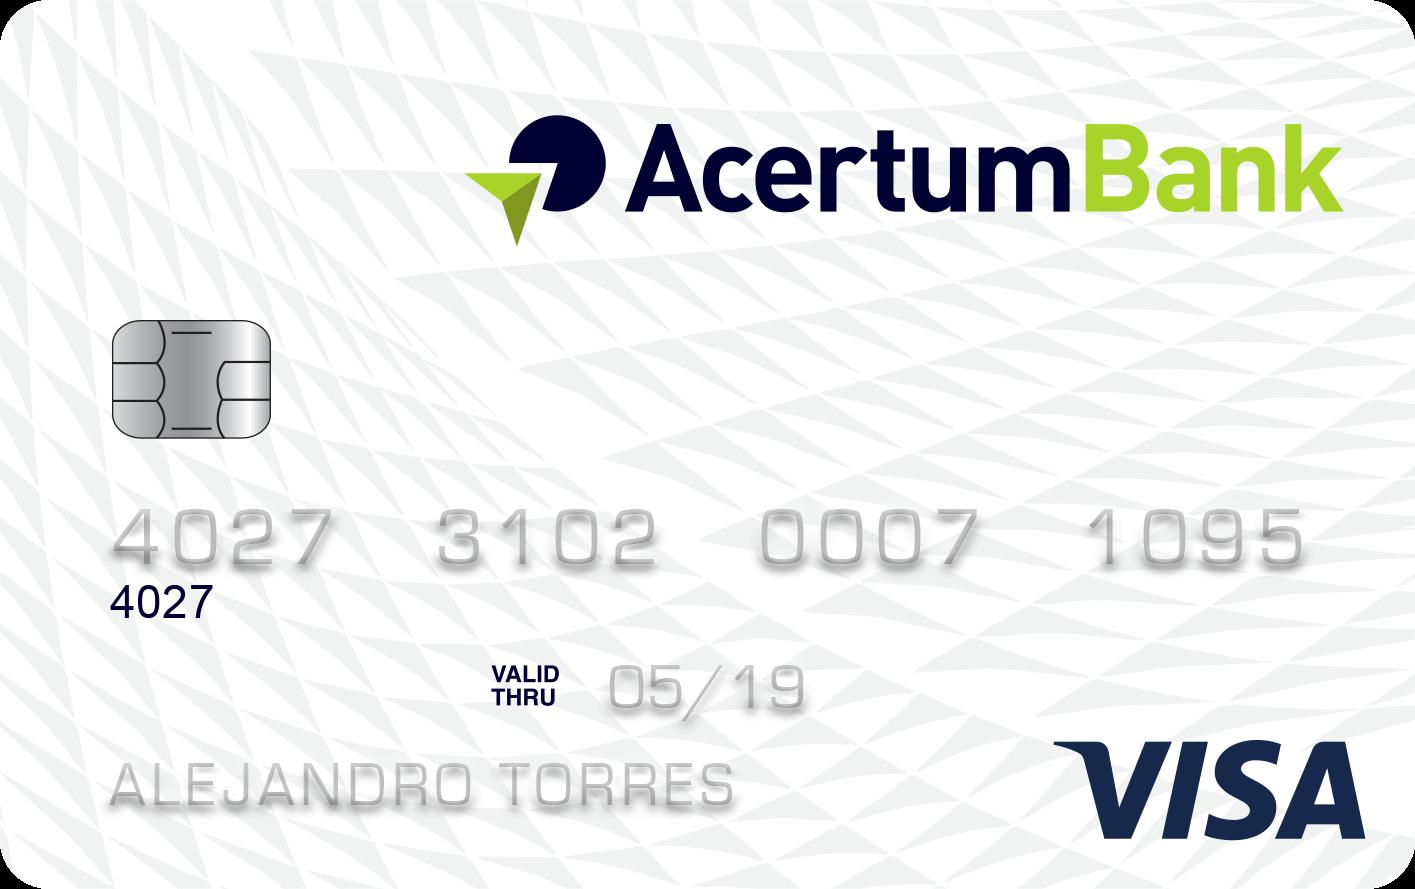 TC_DEBITO Acertumbank